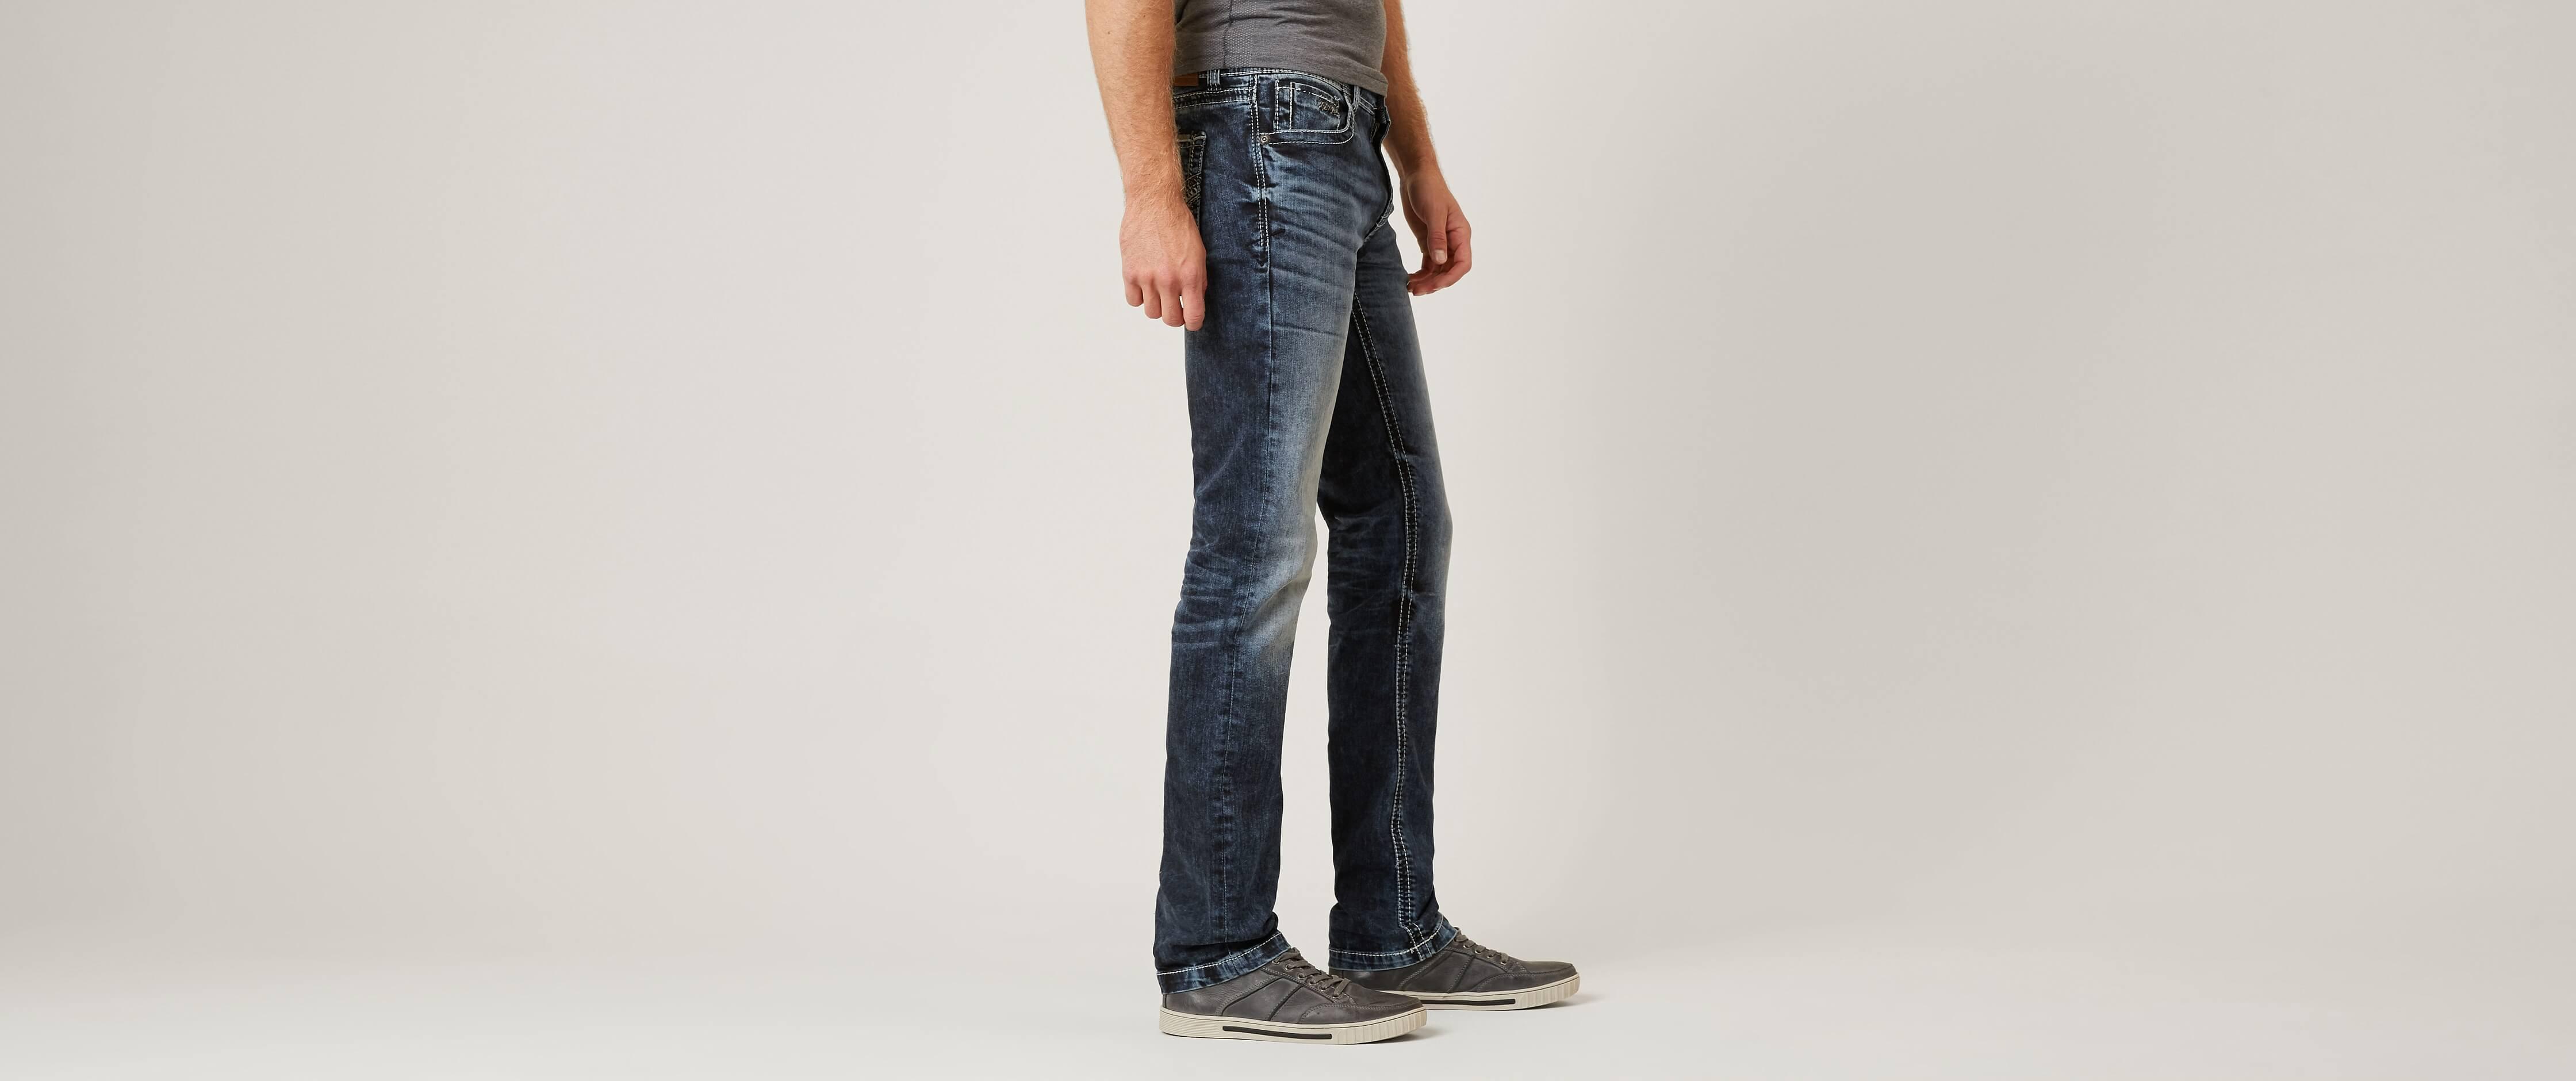 26143353ce6 Buckle Black Three Straight Stretch Jean  6XuXh0100197  -  30.99